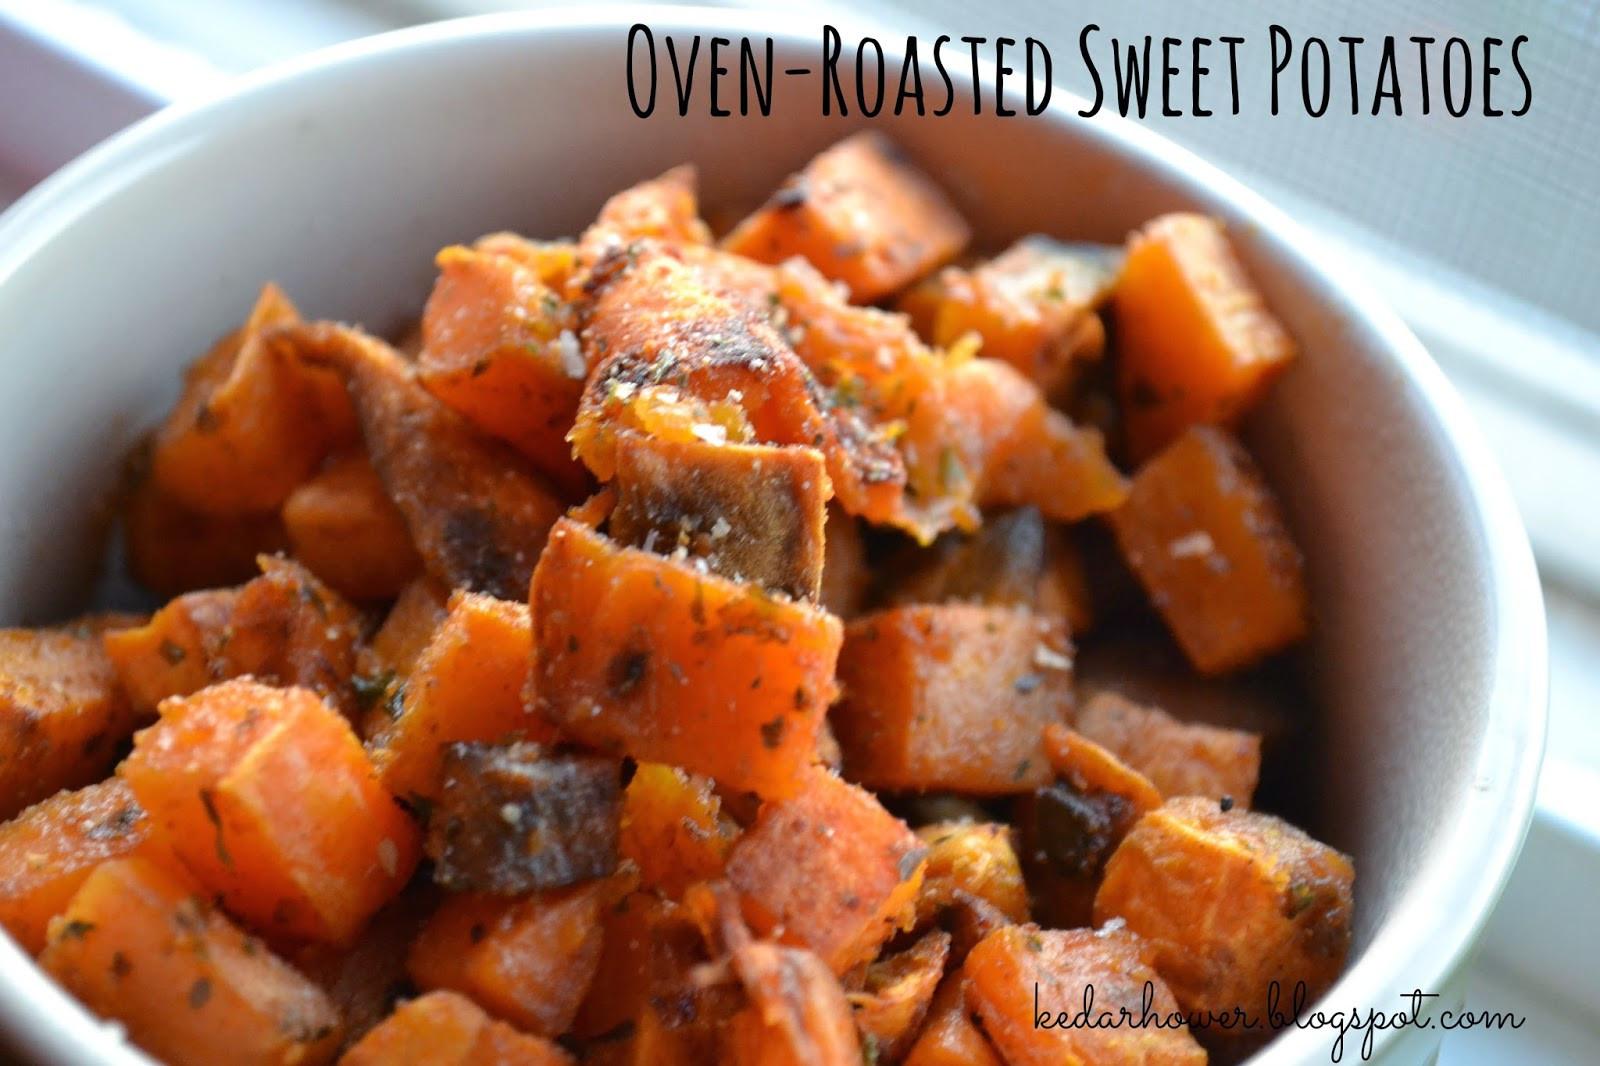 Oven Roasted Sweet Potatoes  Stuff Things etc Oven Roasted Sweet Potatoes